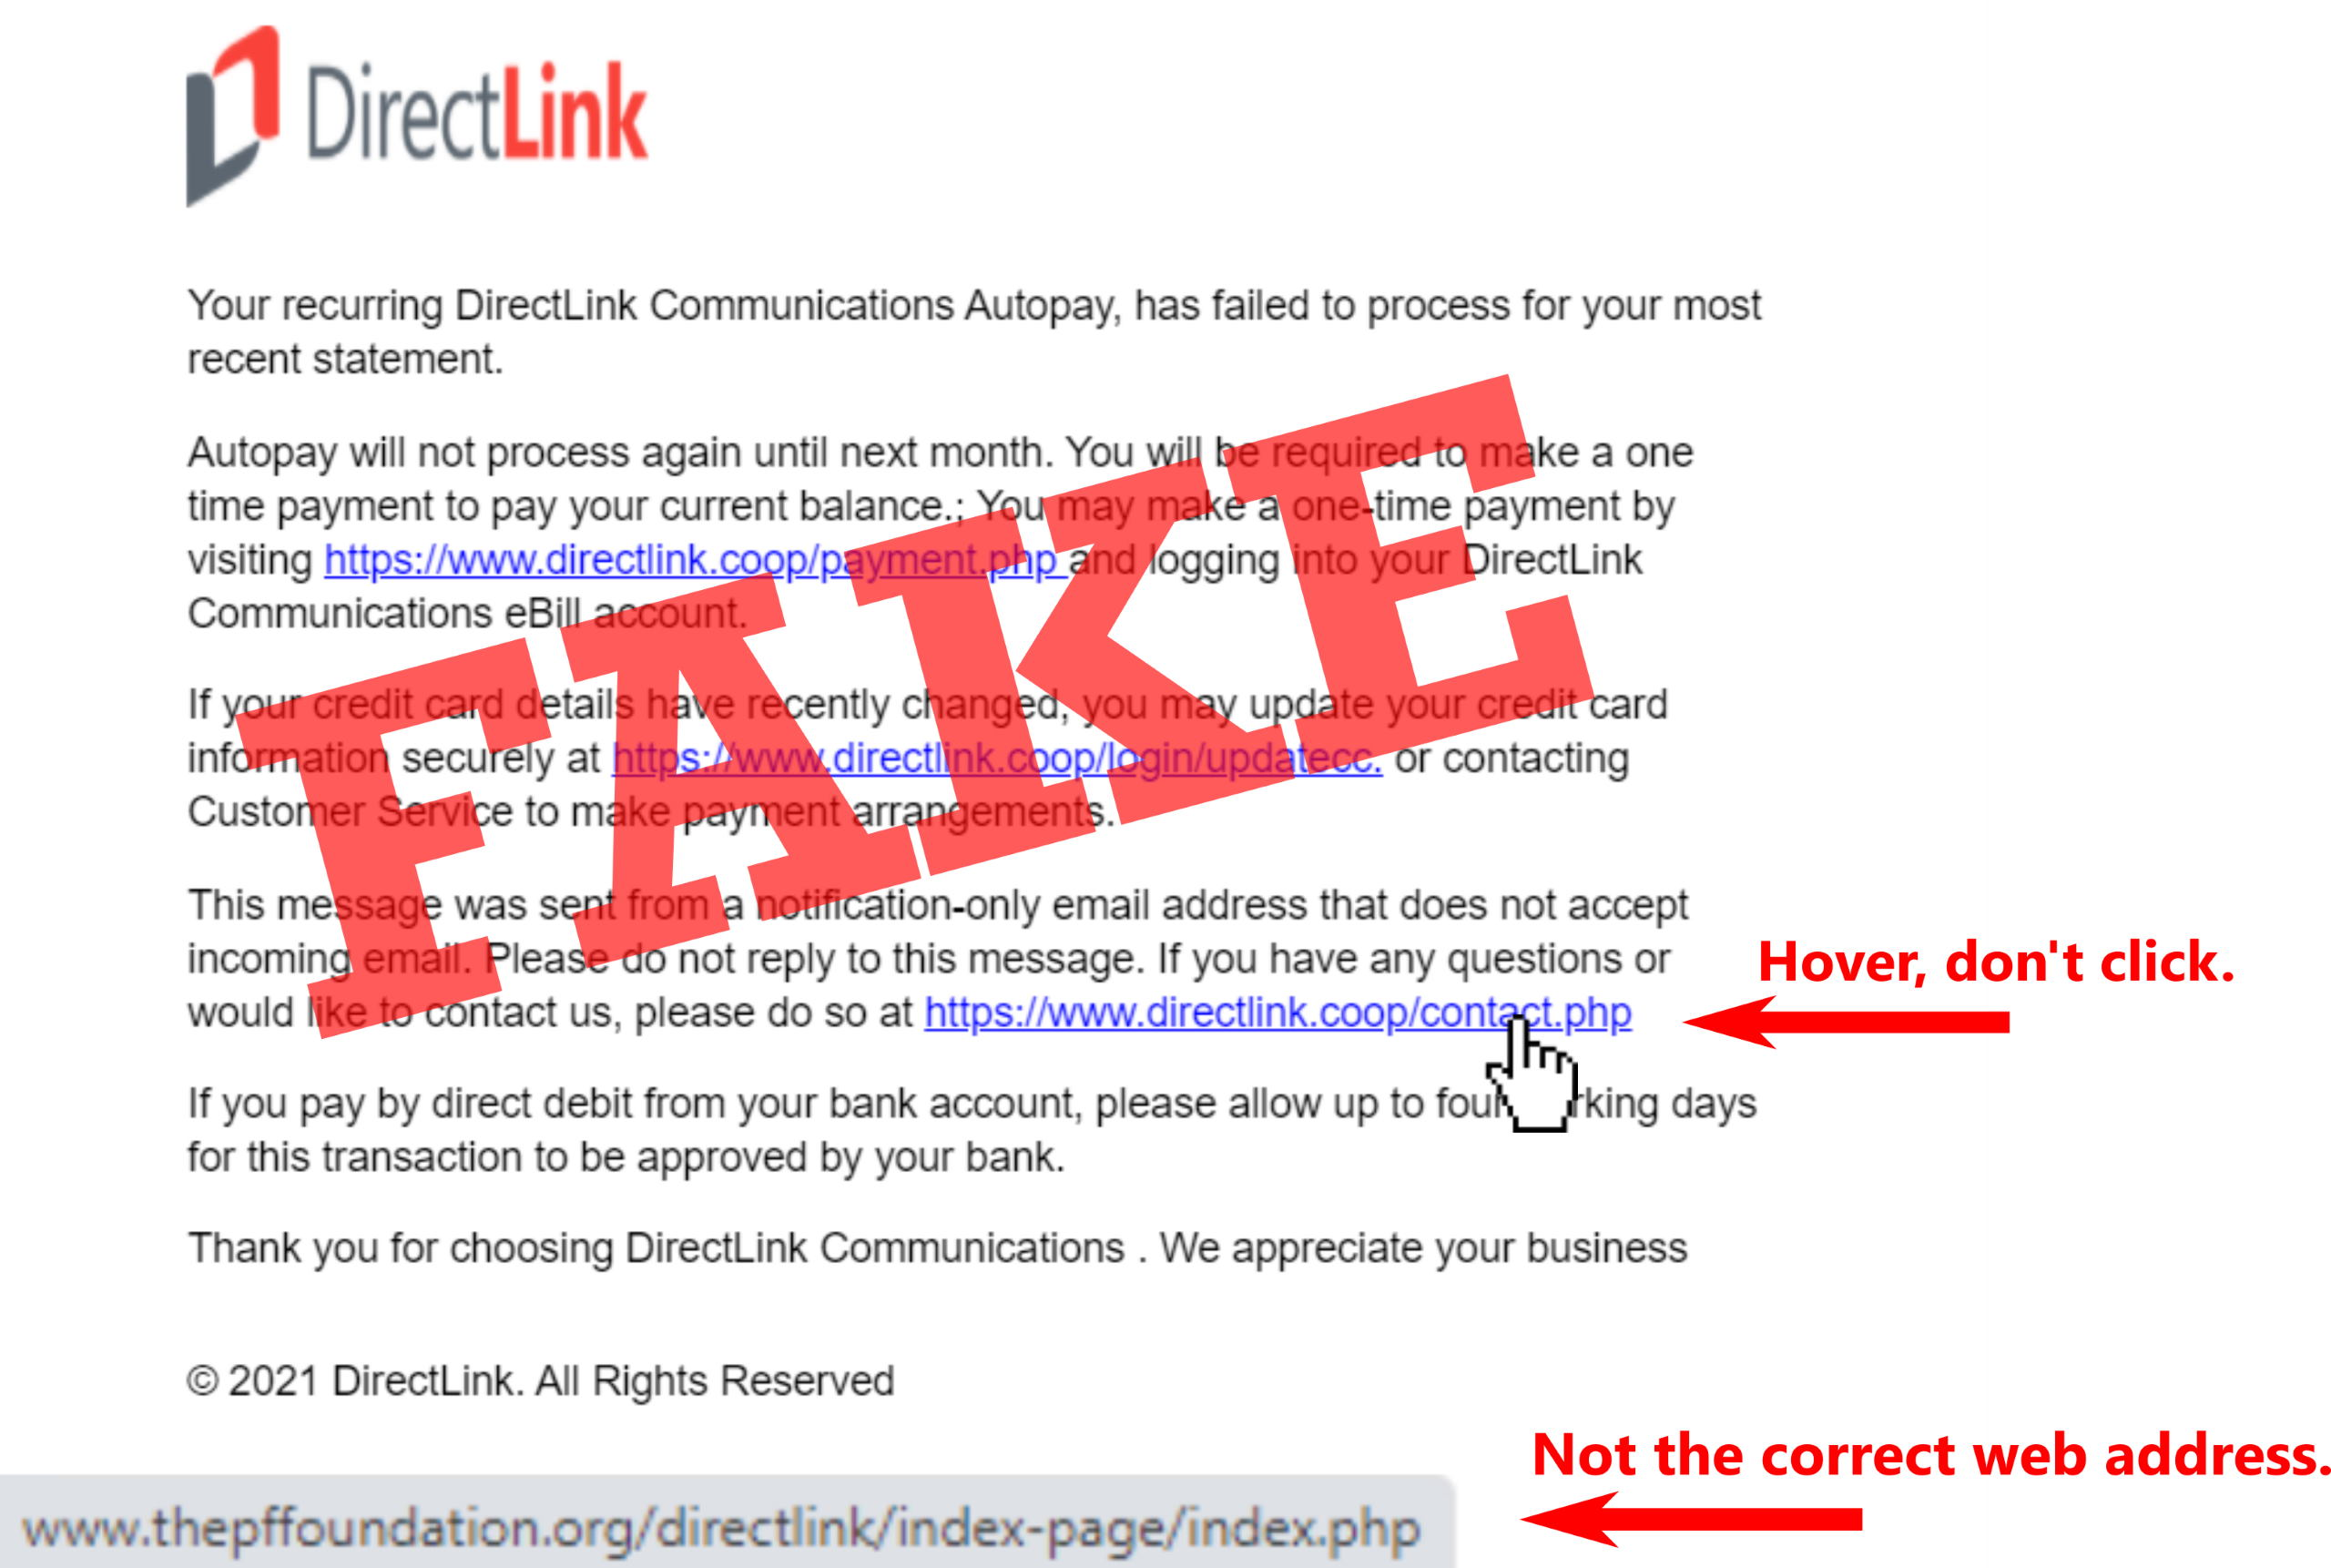 SCAM ALERT: Fake Email Targeting DirectLink Members' Payment Information